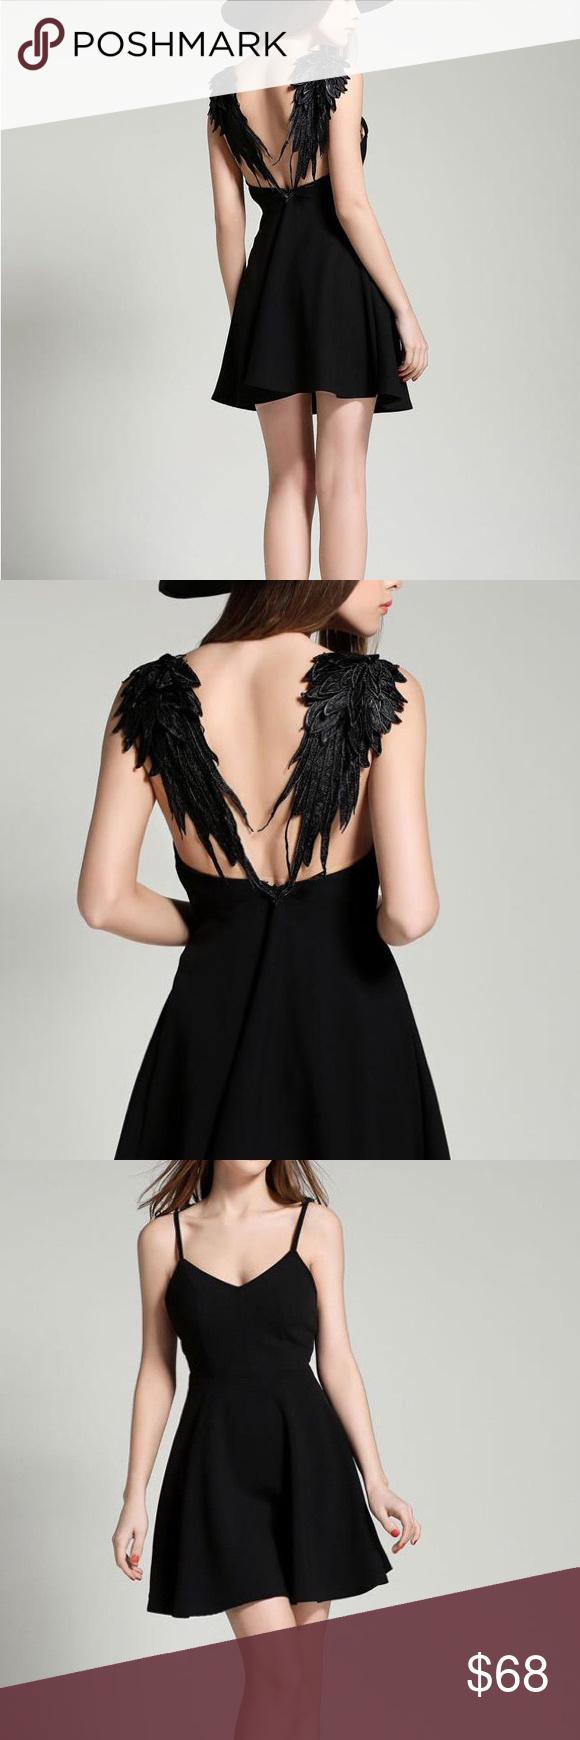 Black Angel Wings Mini Dress Goth Chic Boutique   Kleider, Halloween ...